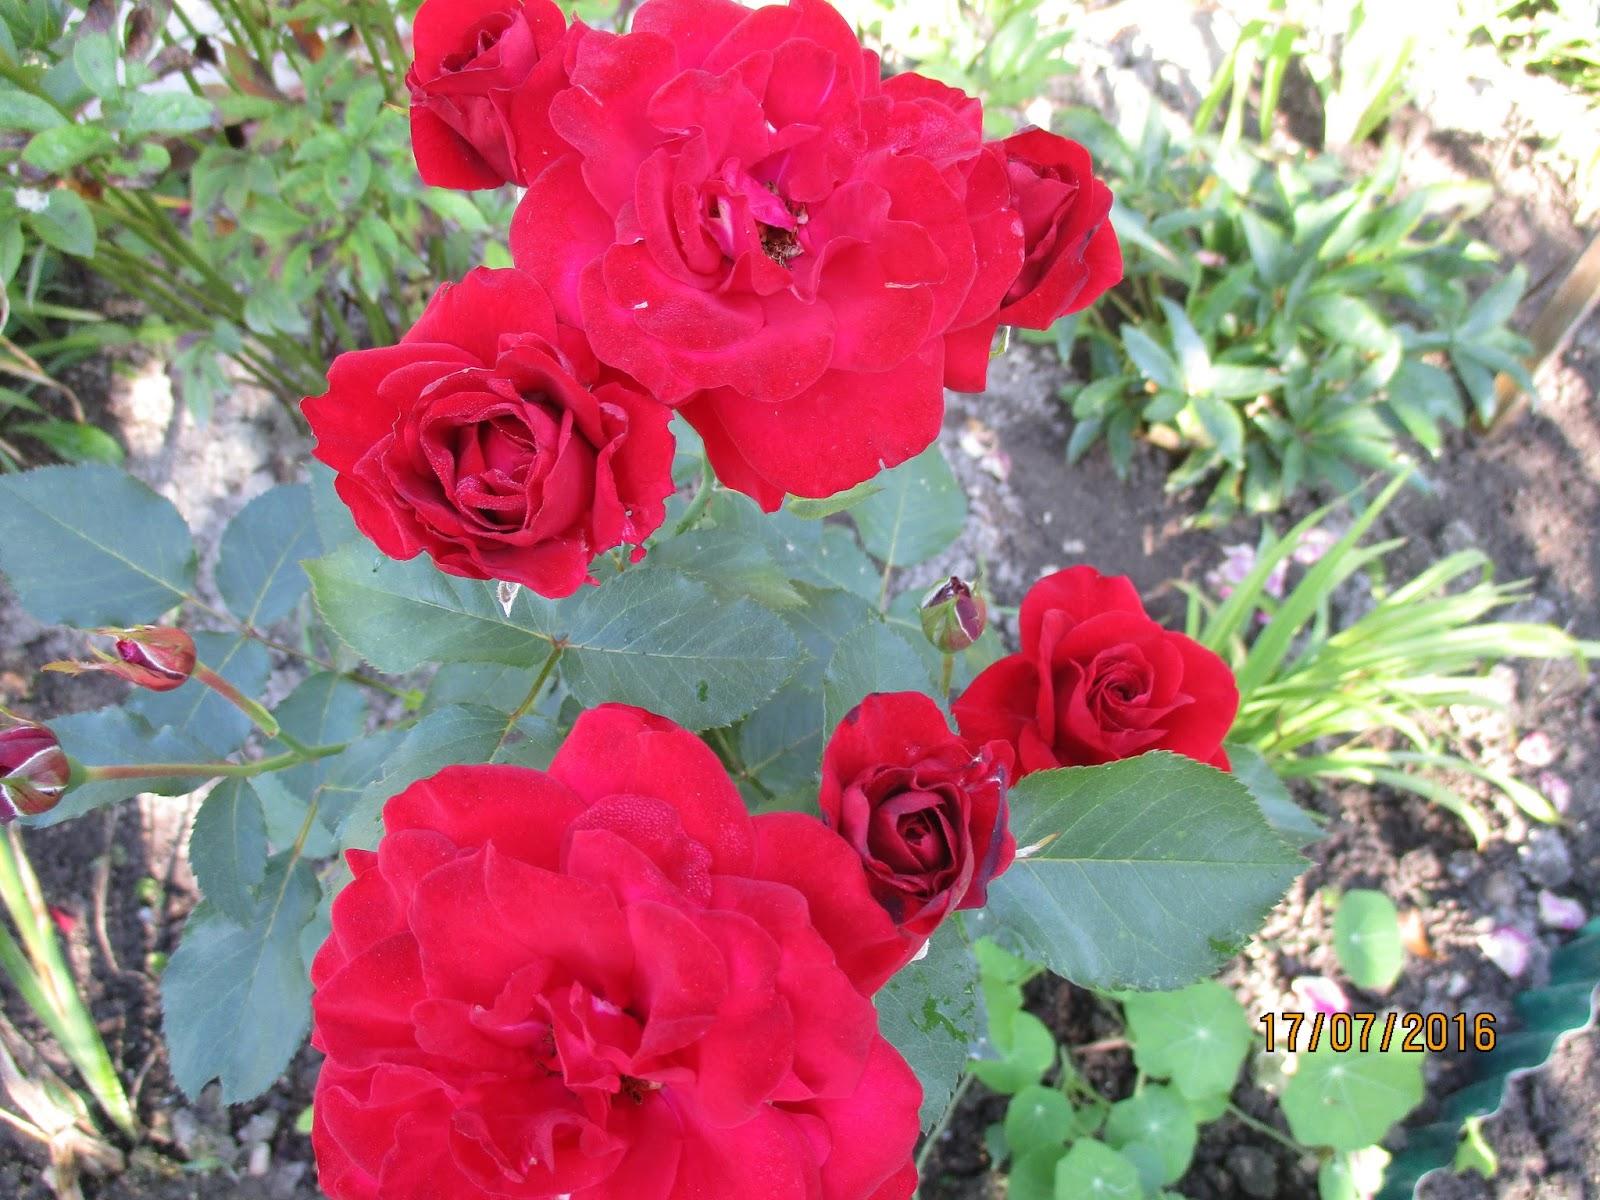 beaut s florales rosier 39 nina weibull 39. Black Bedroom Furniture Sets. Home Design Ideas